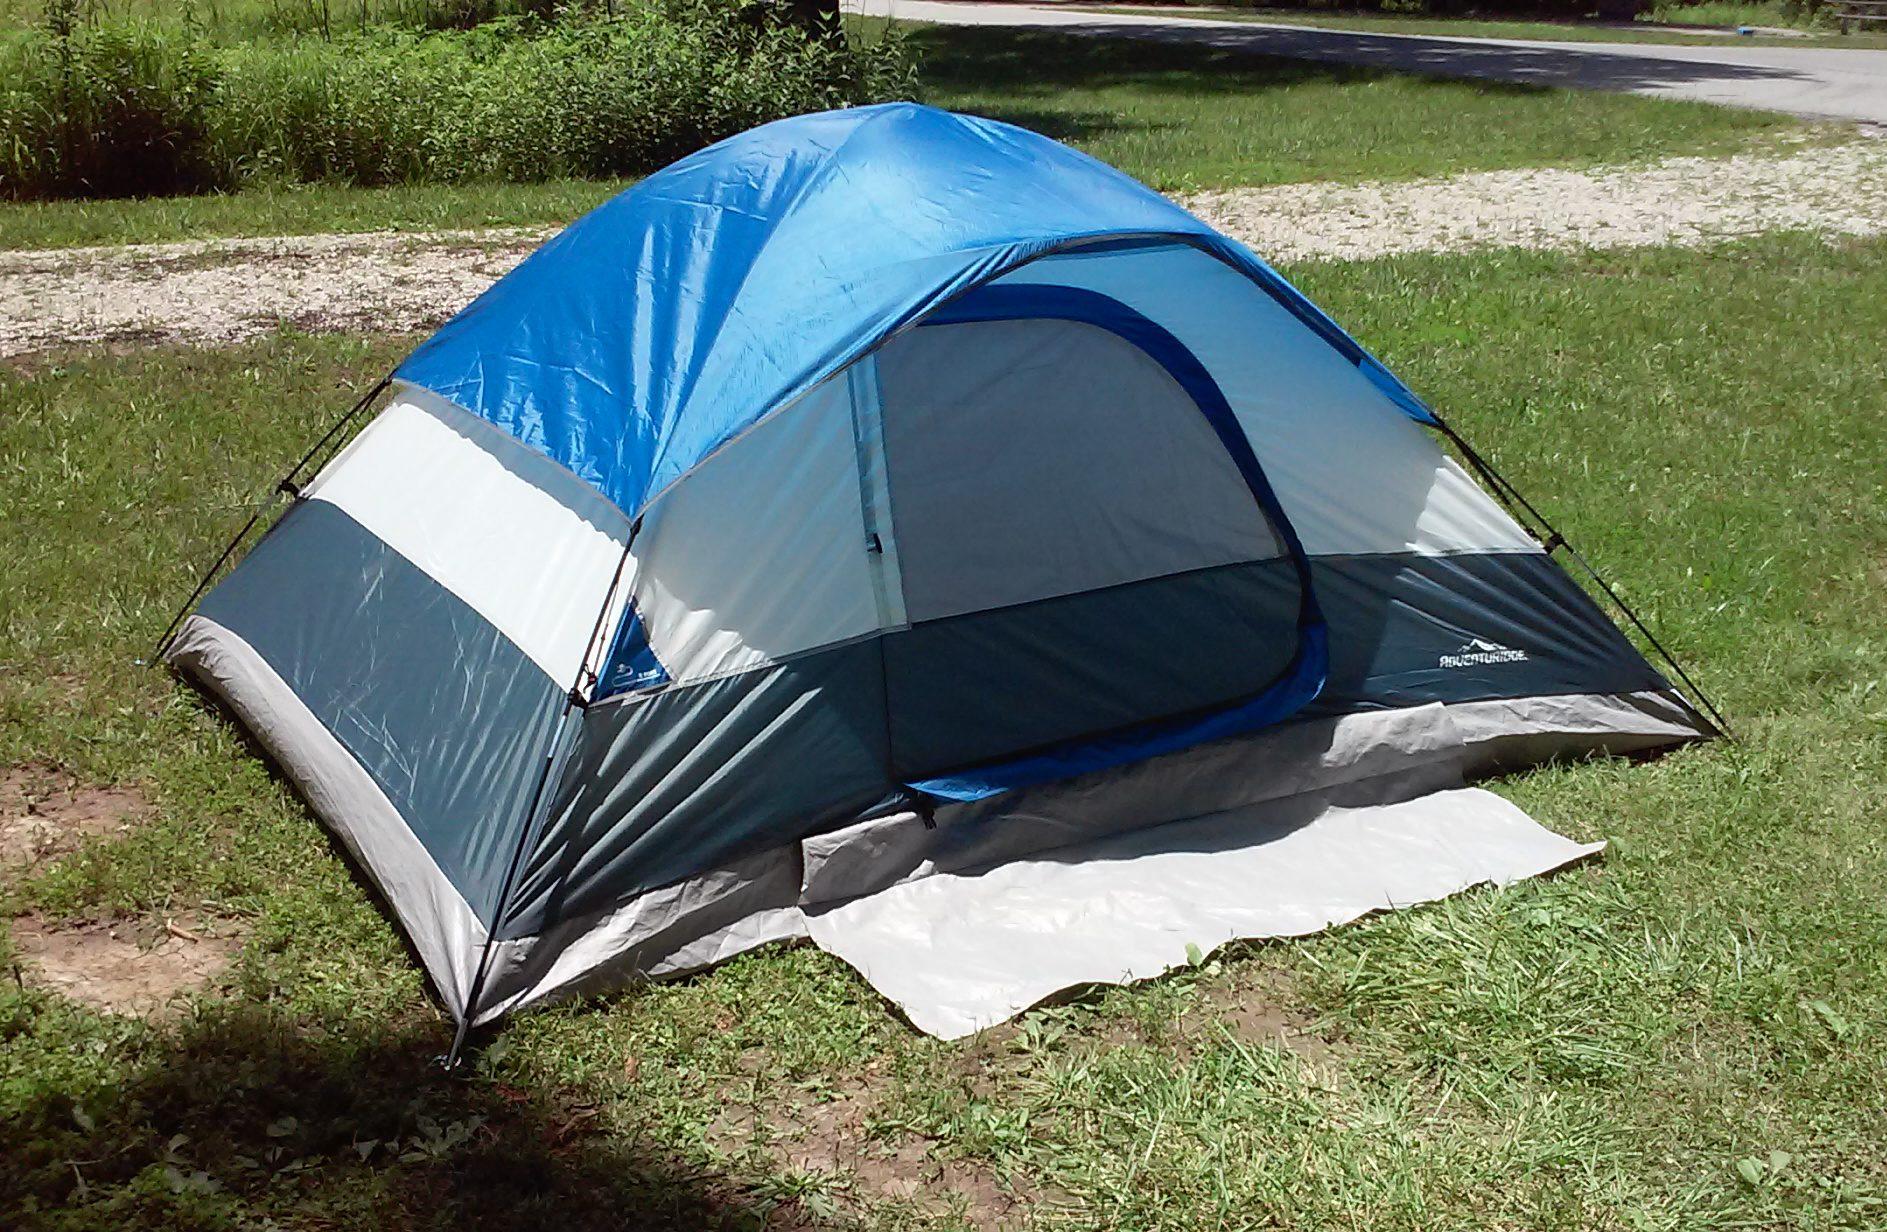 & Adventuridge 4-Person 9u0027 x 7u0027 Dome Tent | ALDI REVIEWER